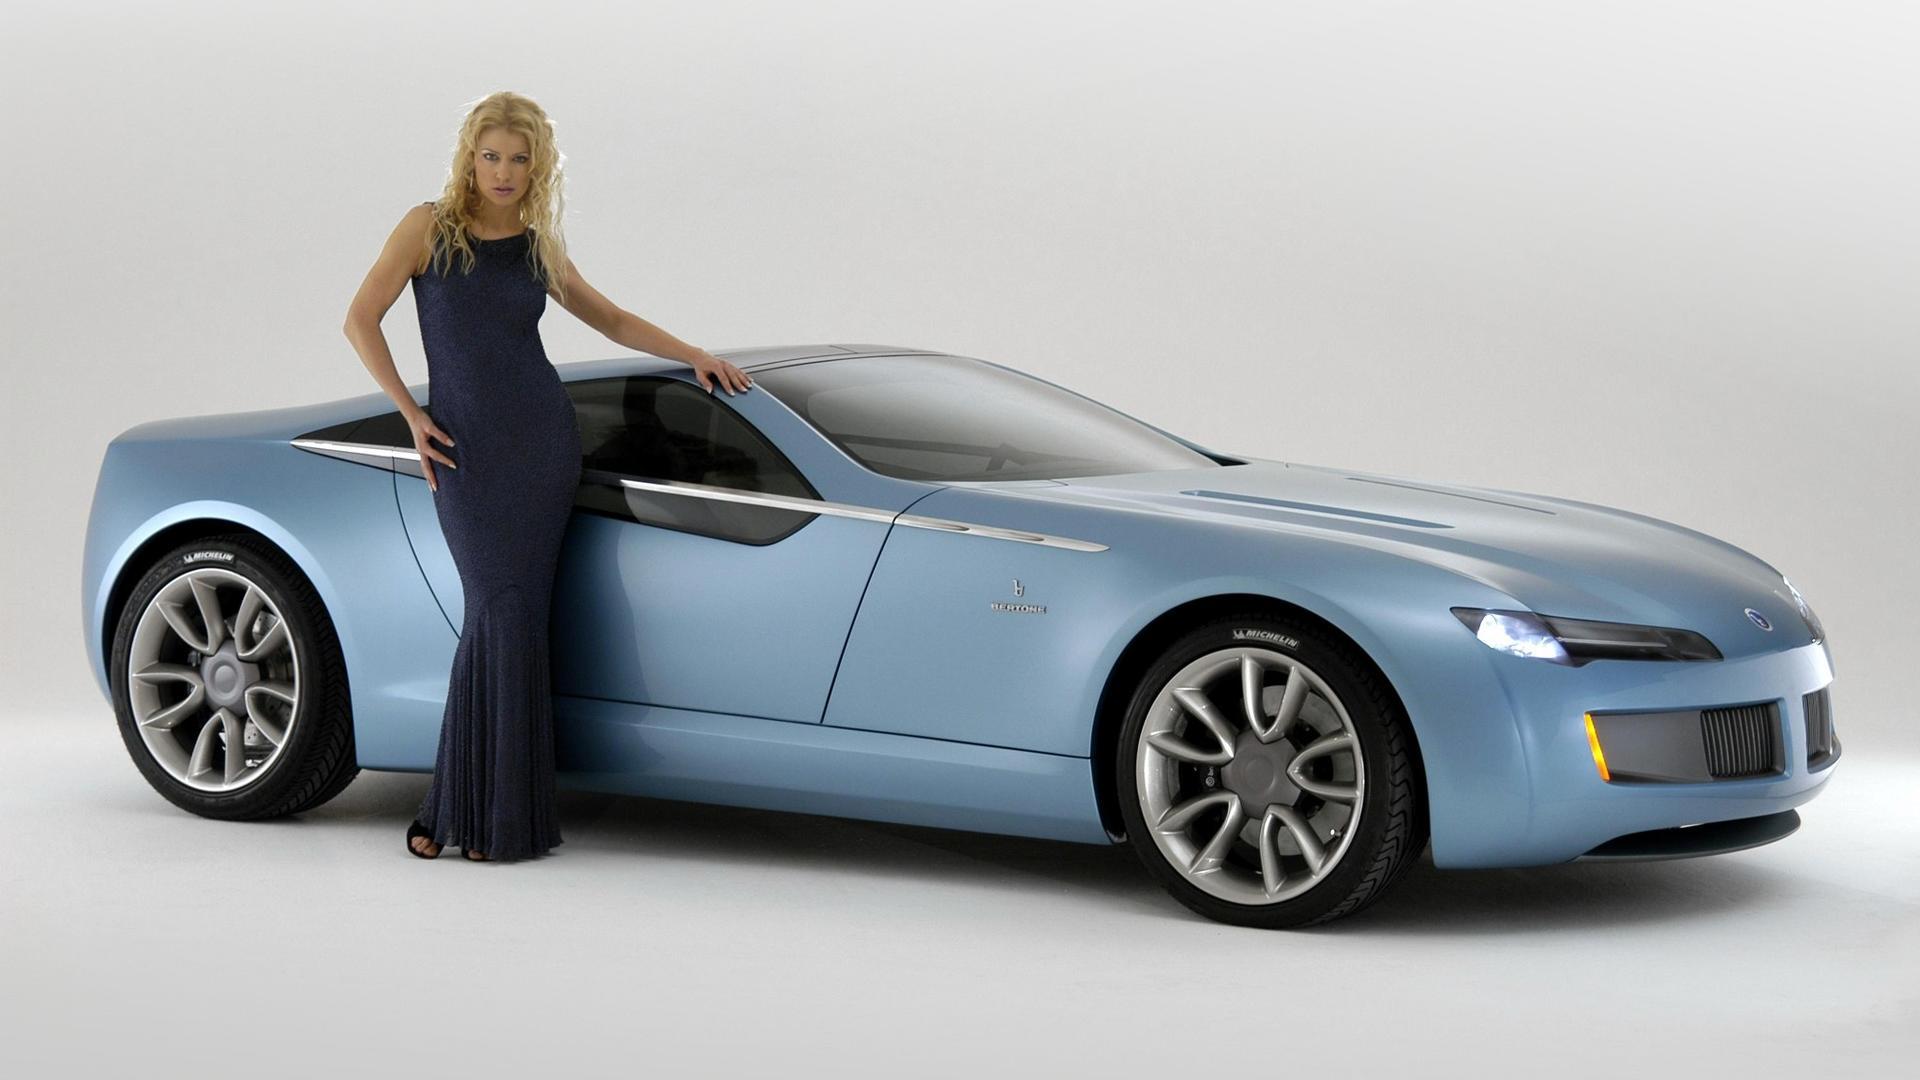 2003-bertone-birusa-concept2